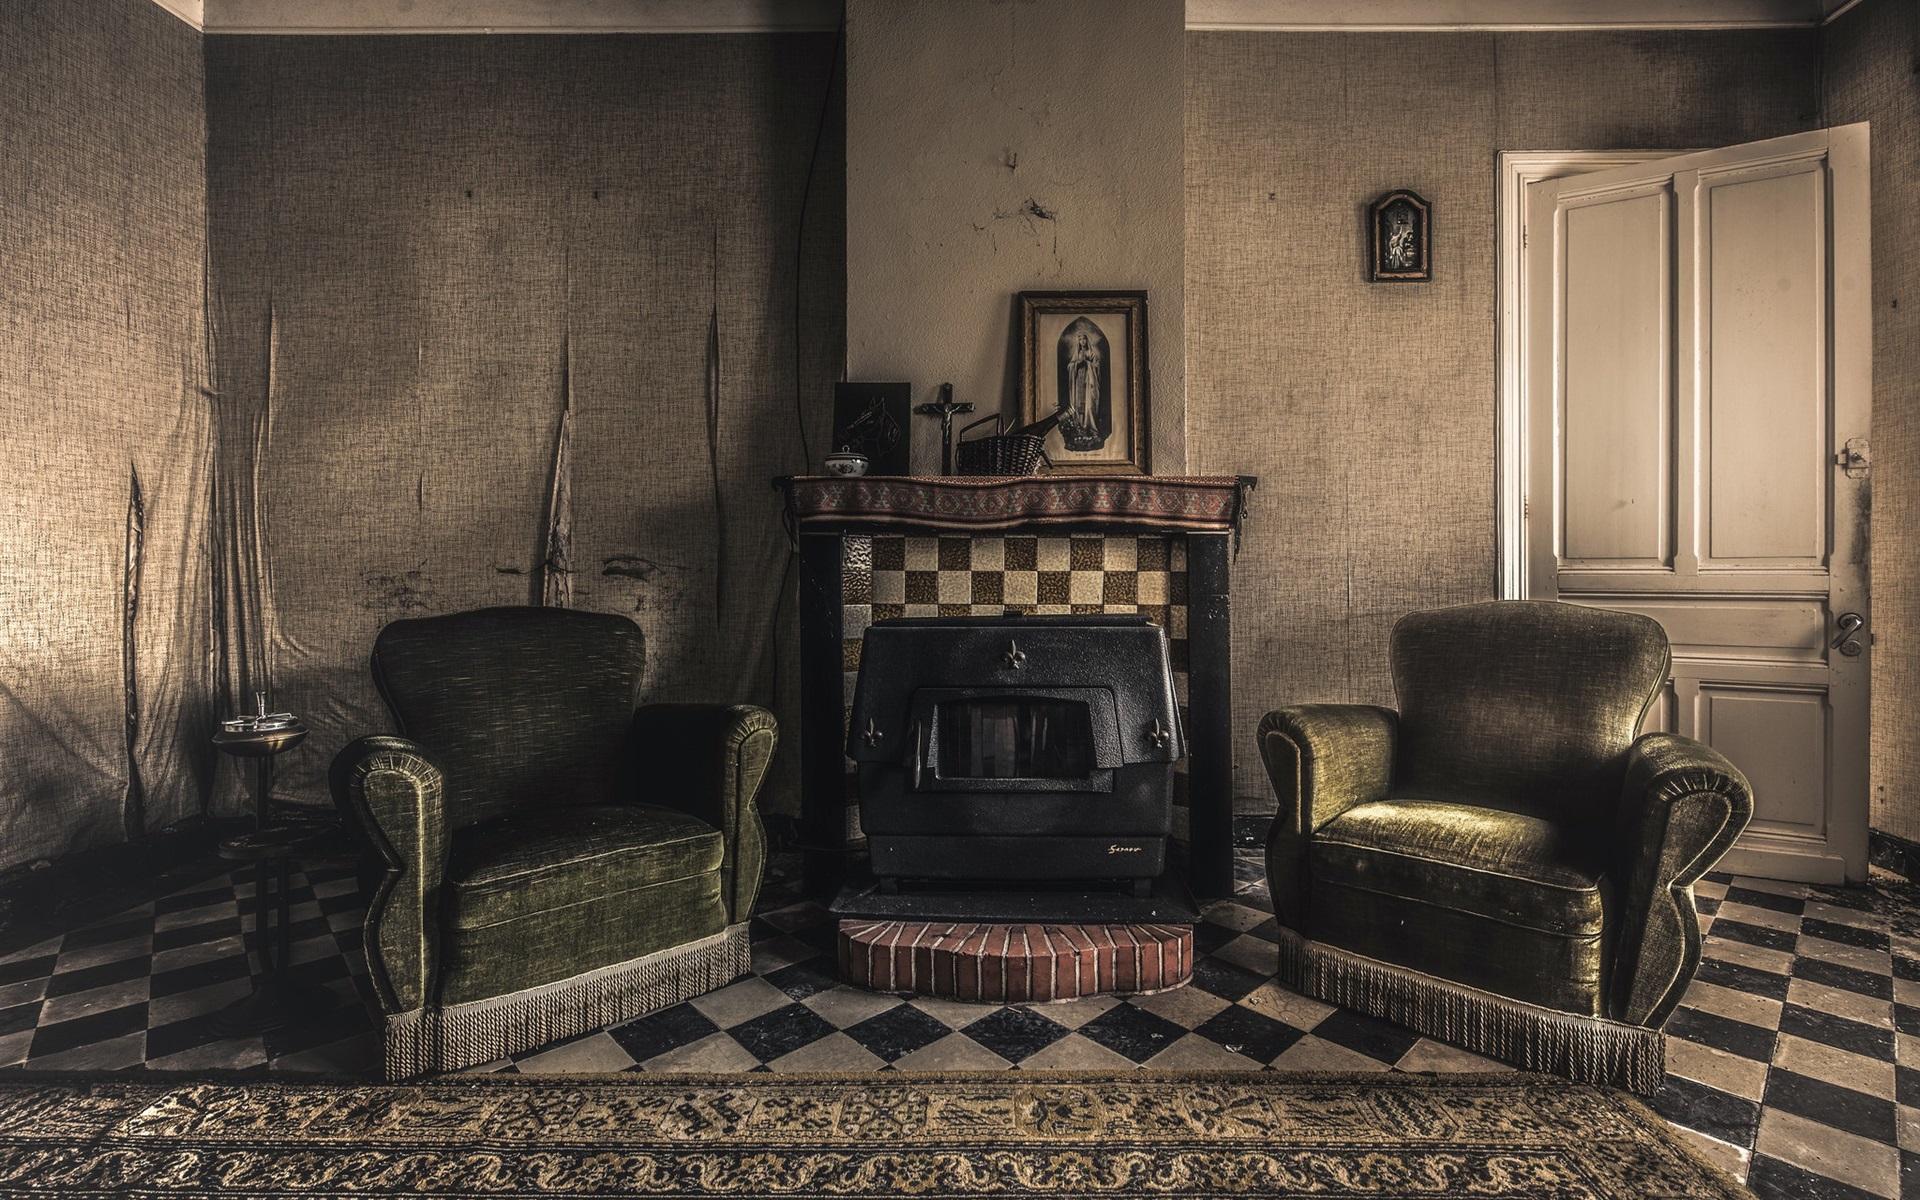 комната в ретро стиле картинки просеянную муку креманку